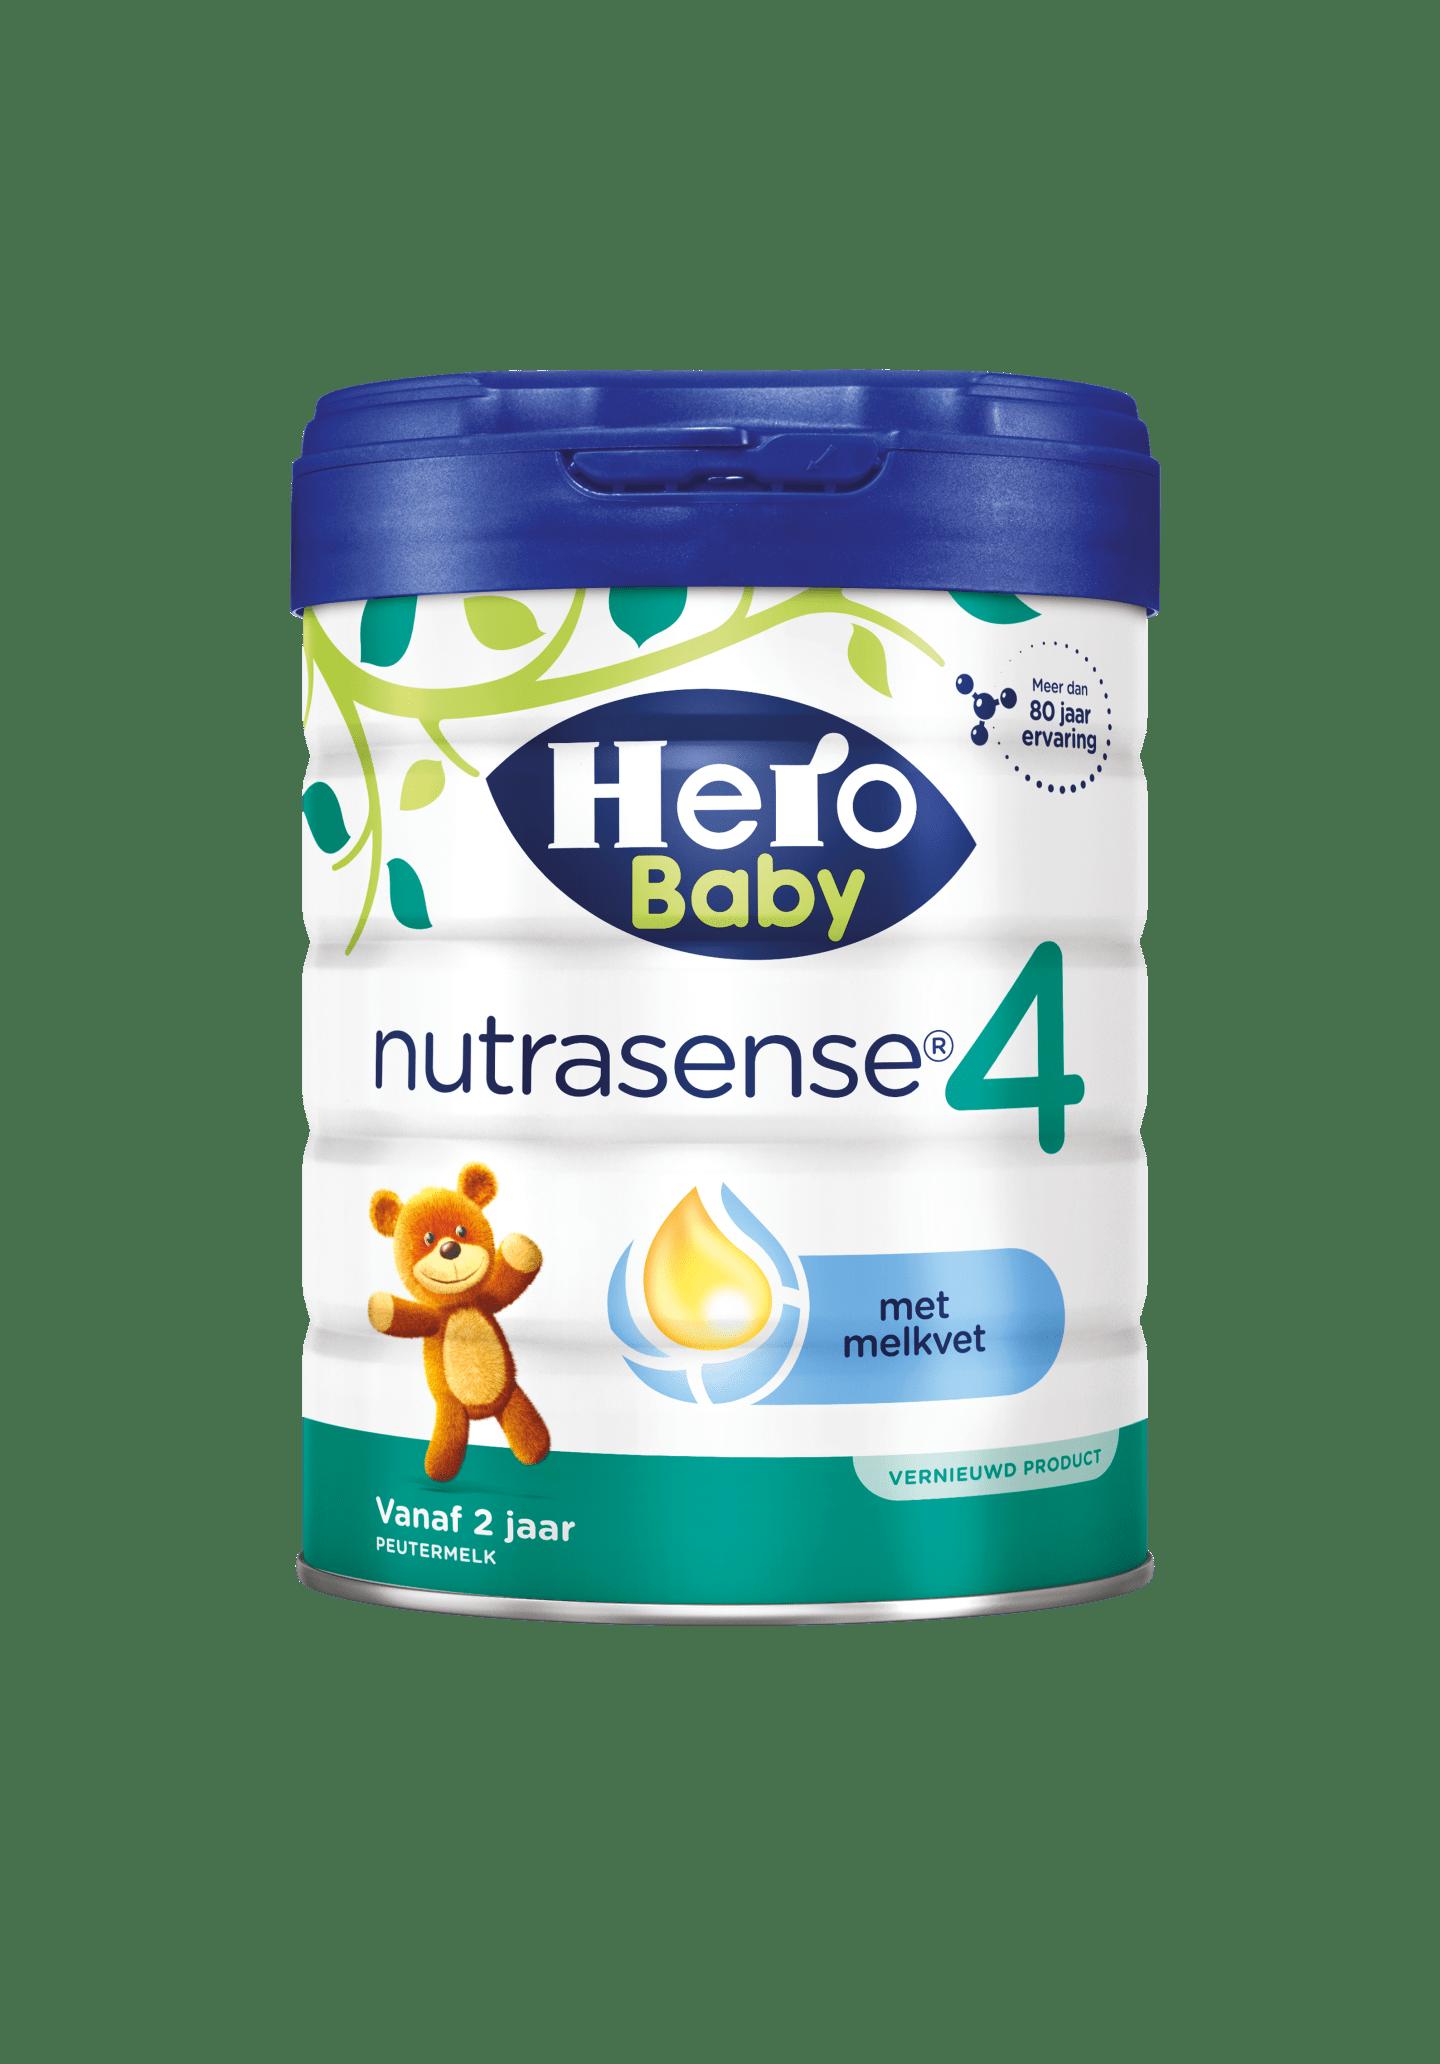 Hero Baby Nutrasense® 4